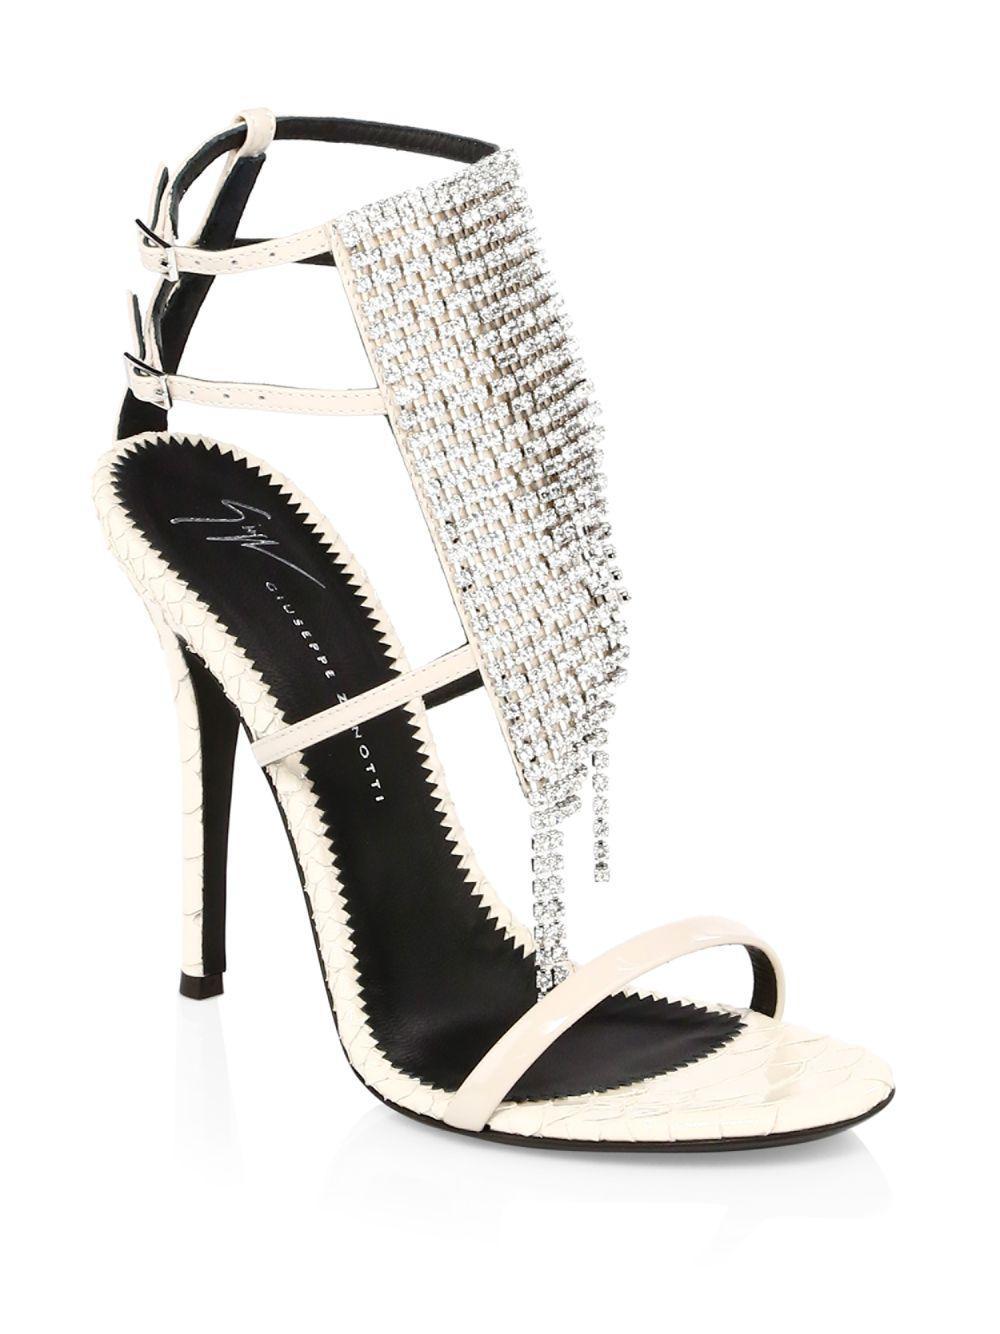 77e977ecfa0 Lyst - Giuseppe Zanotti Women s Alien Crystal Stiletto Sandals ...